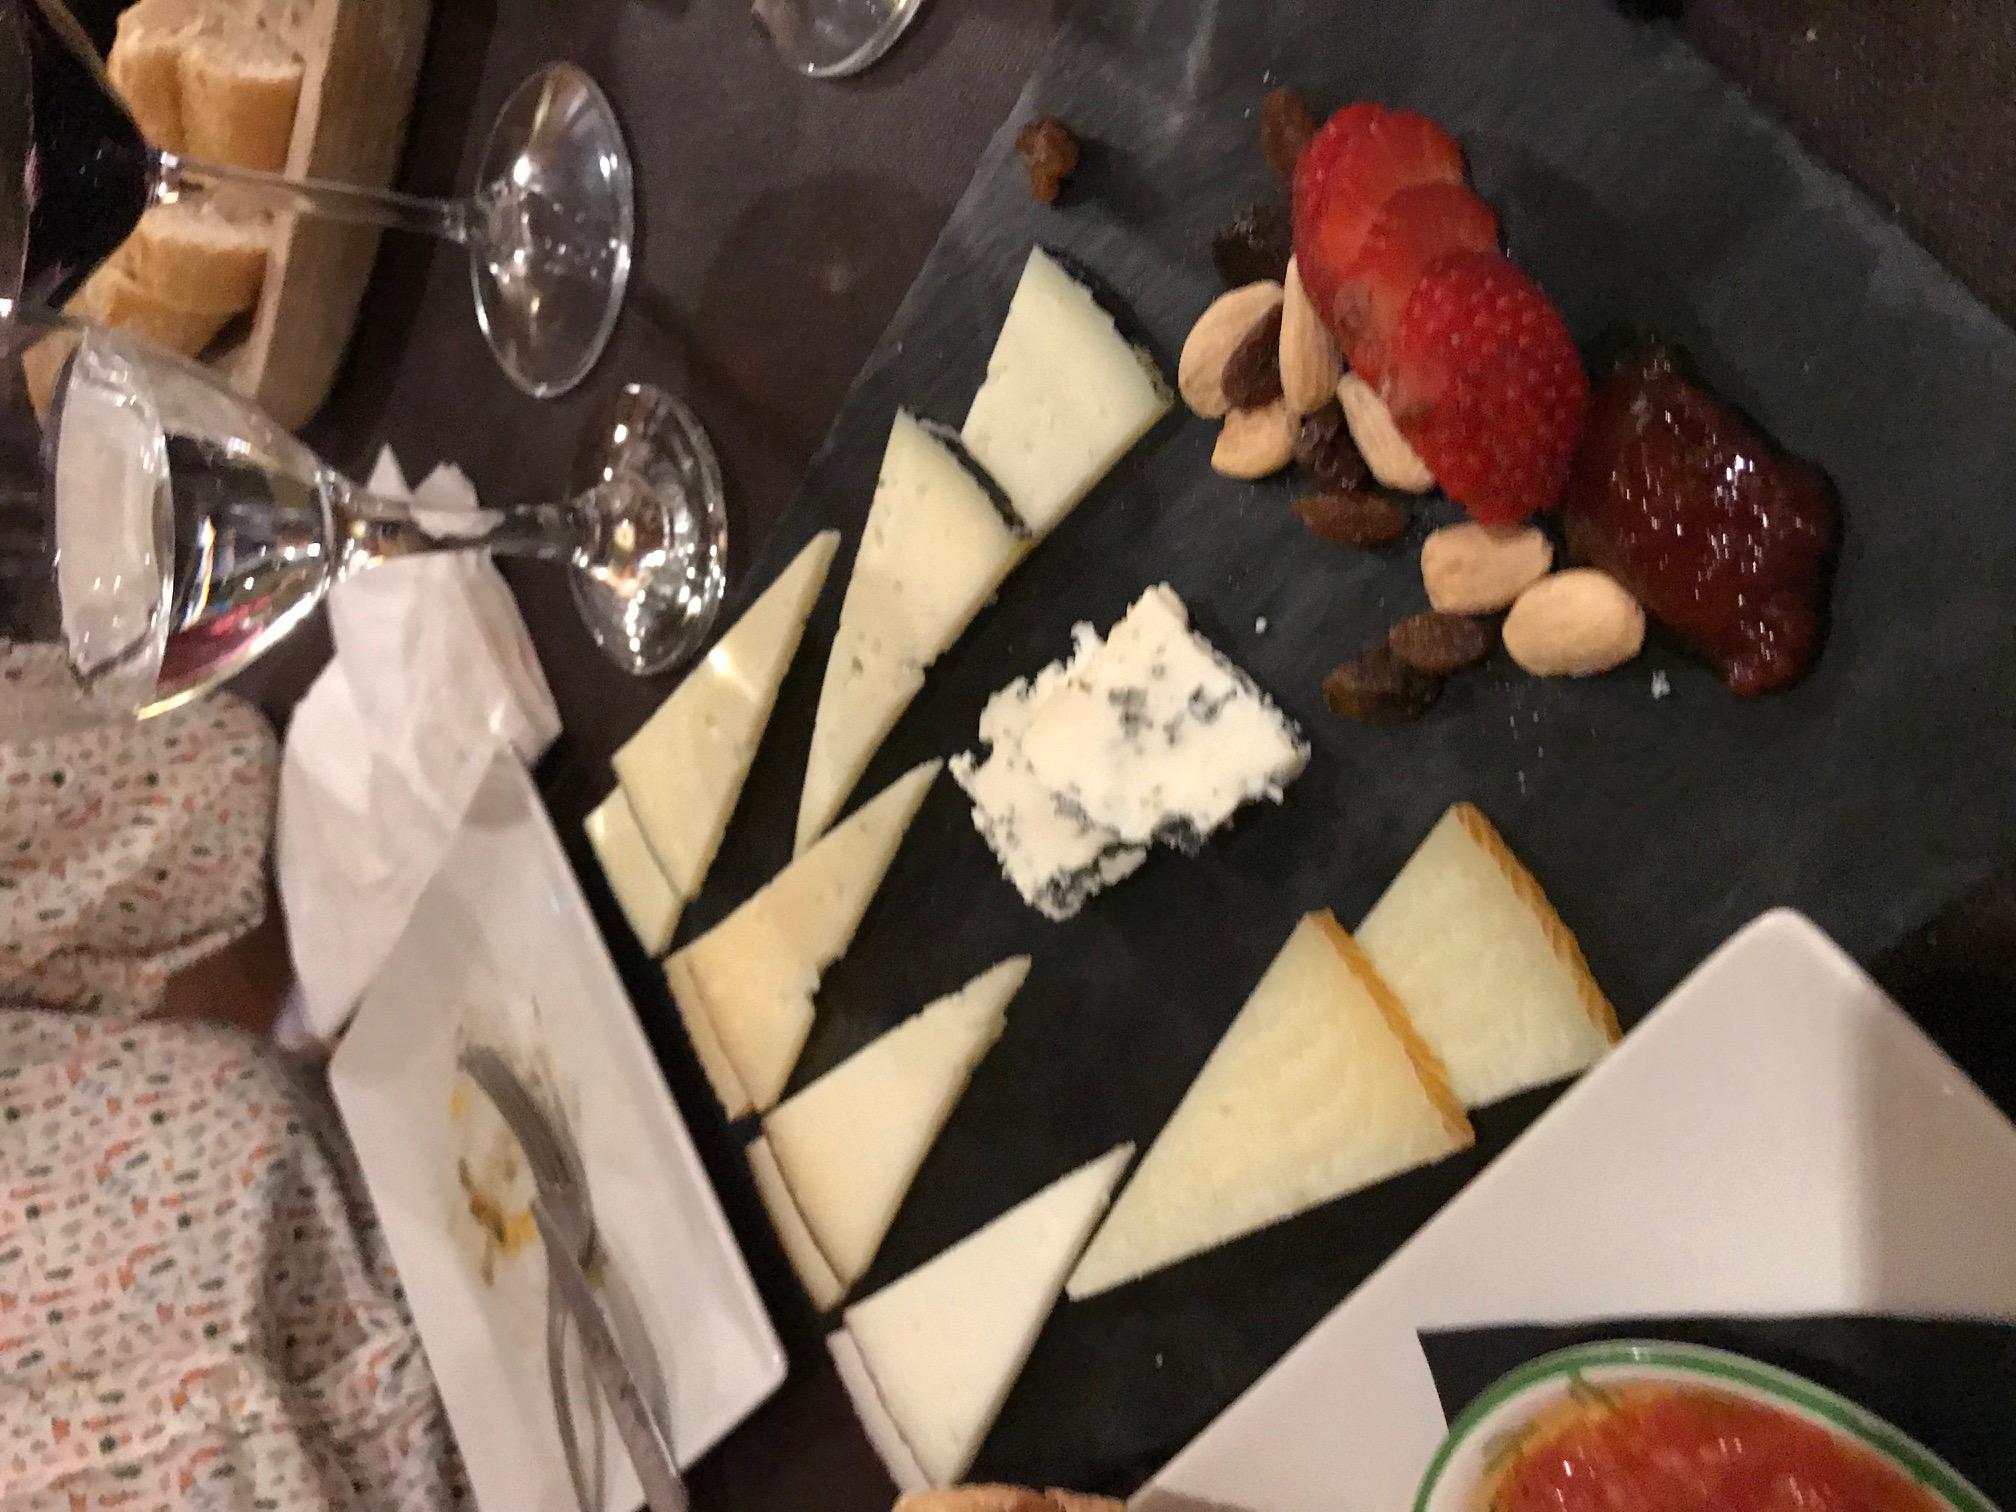 La Cantonada Tabla de quesos.